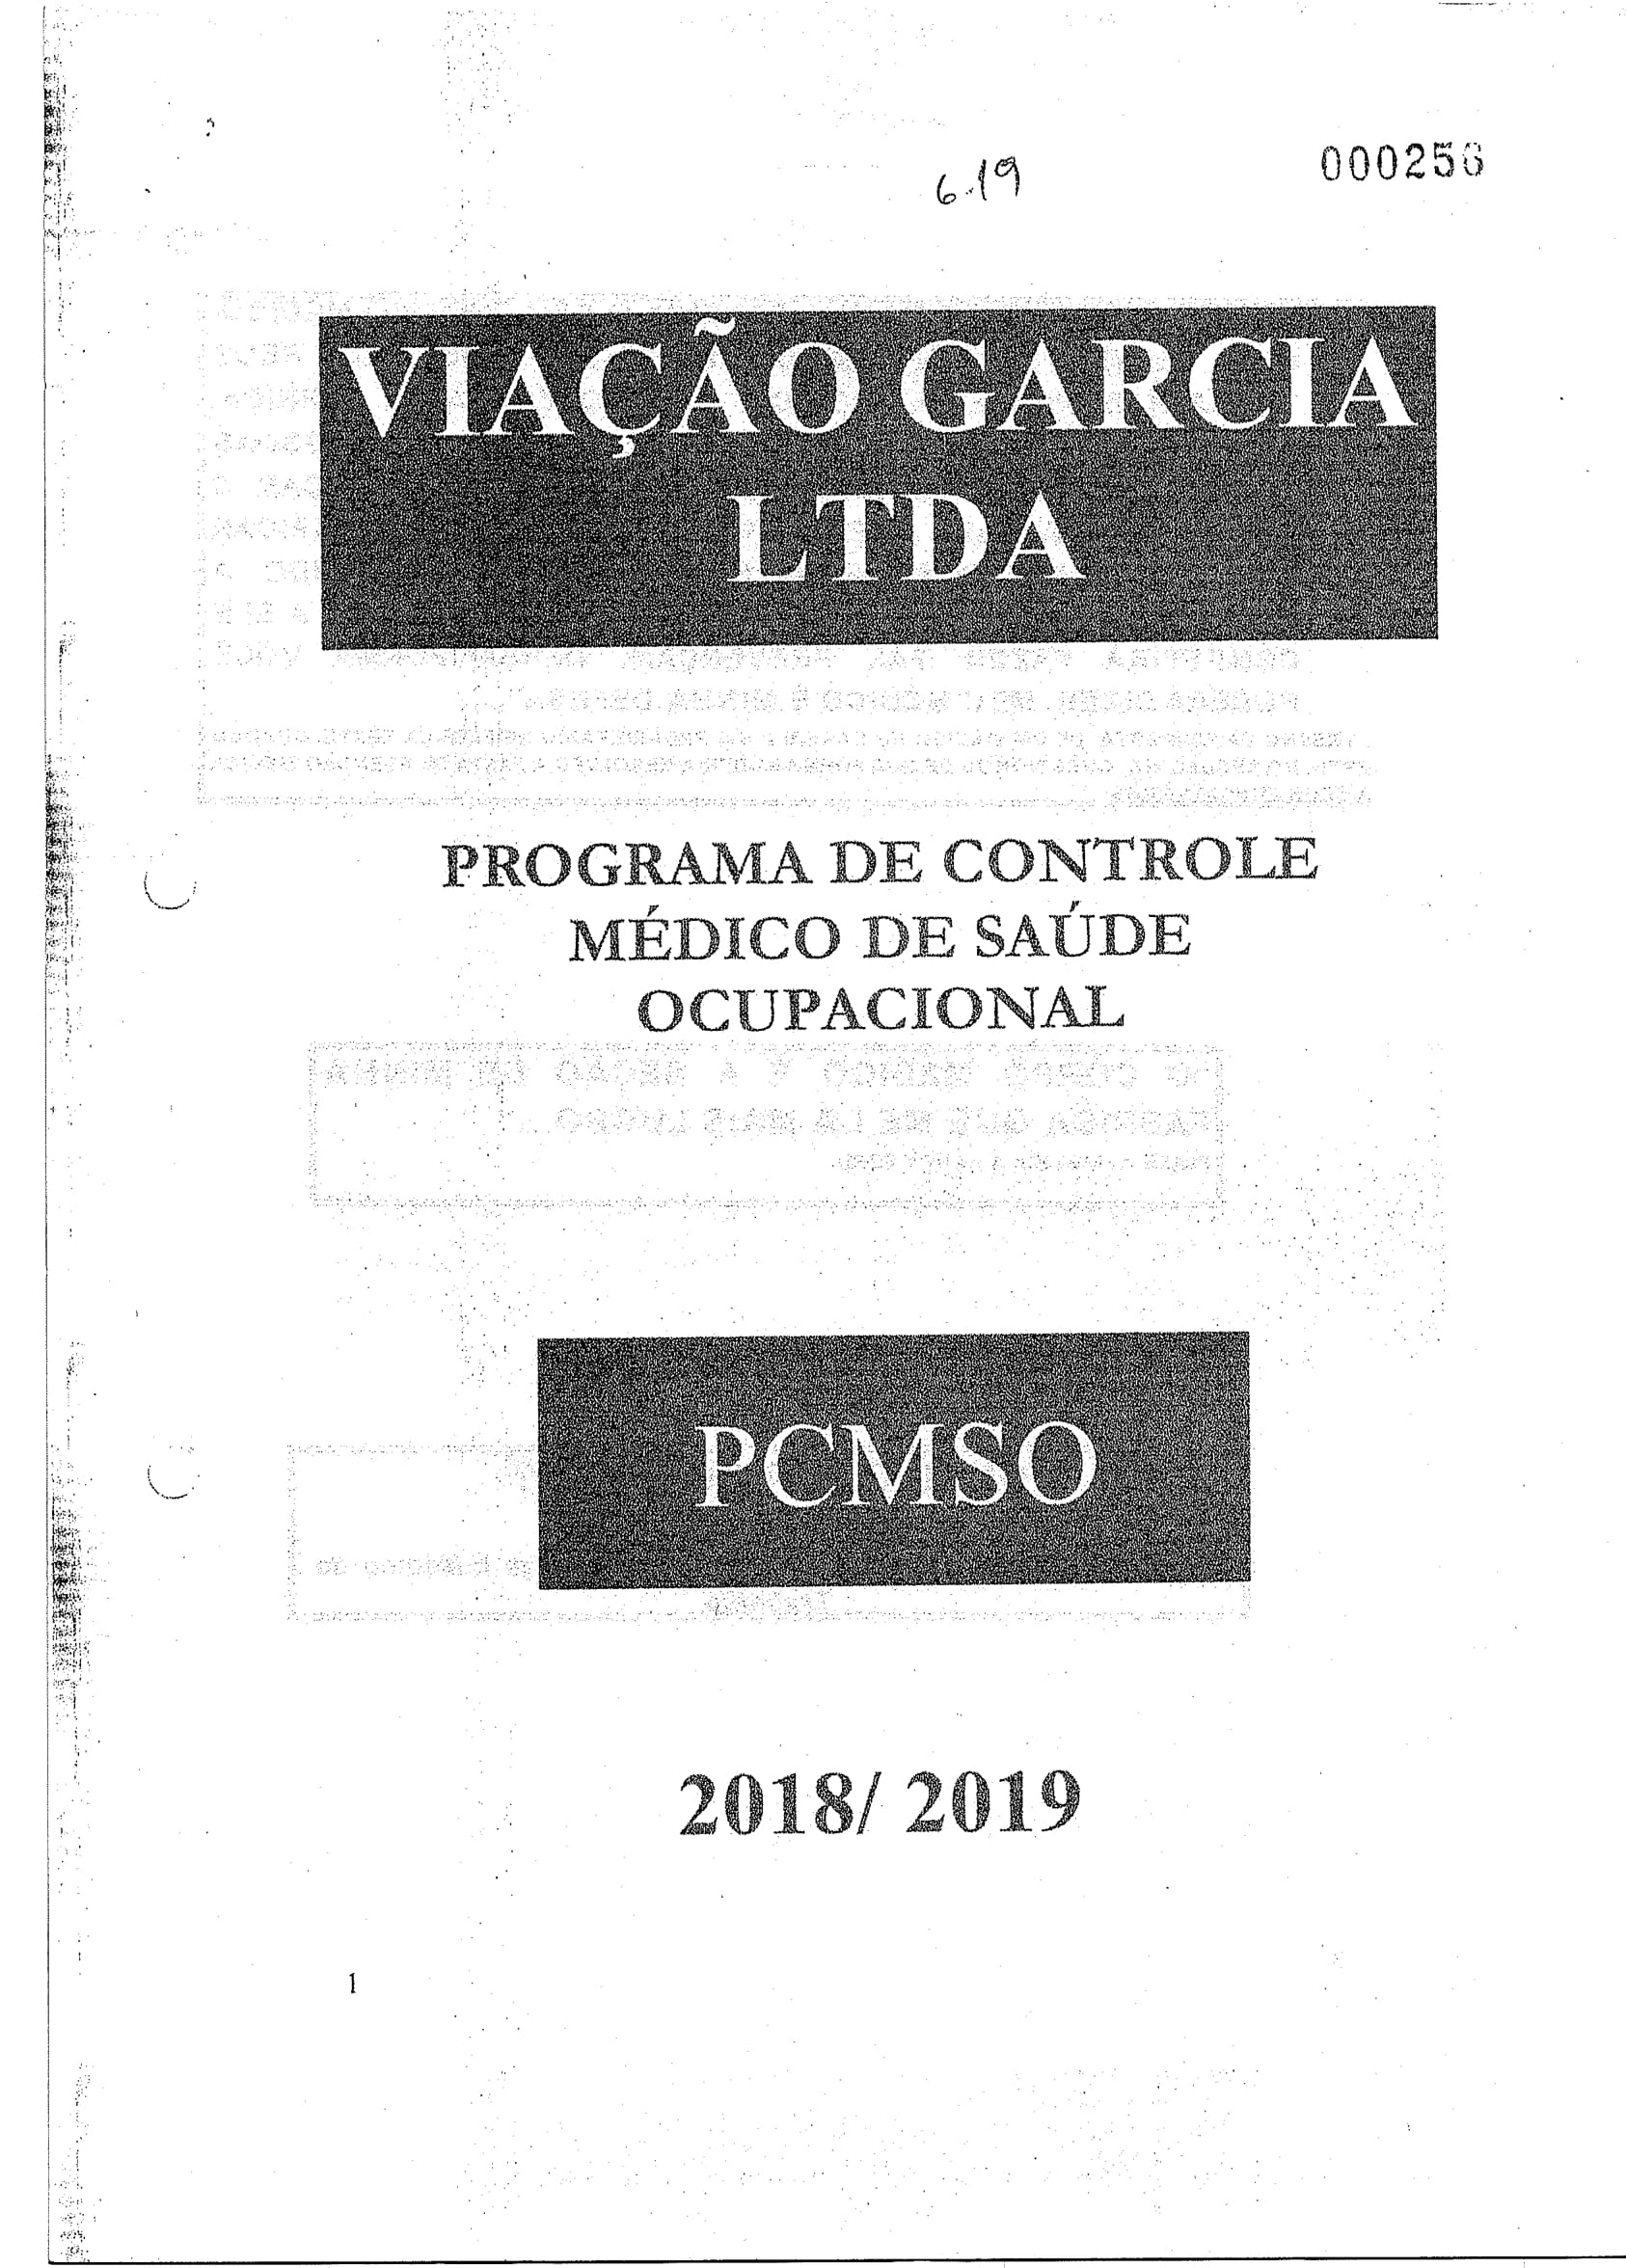 PL001222019-079